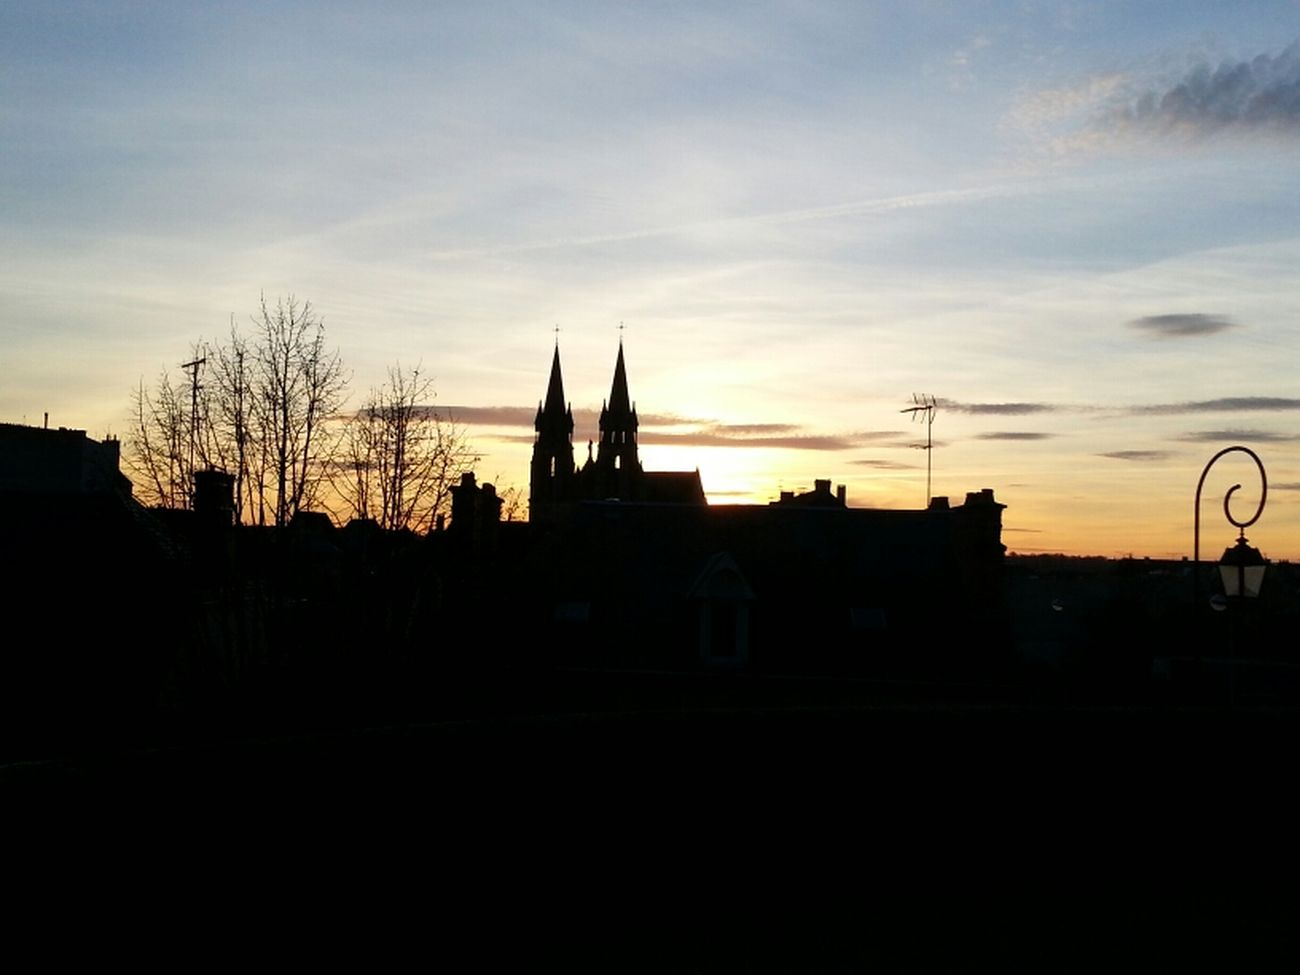 Clouds Sunset Praying City France Church Trees Nice Black